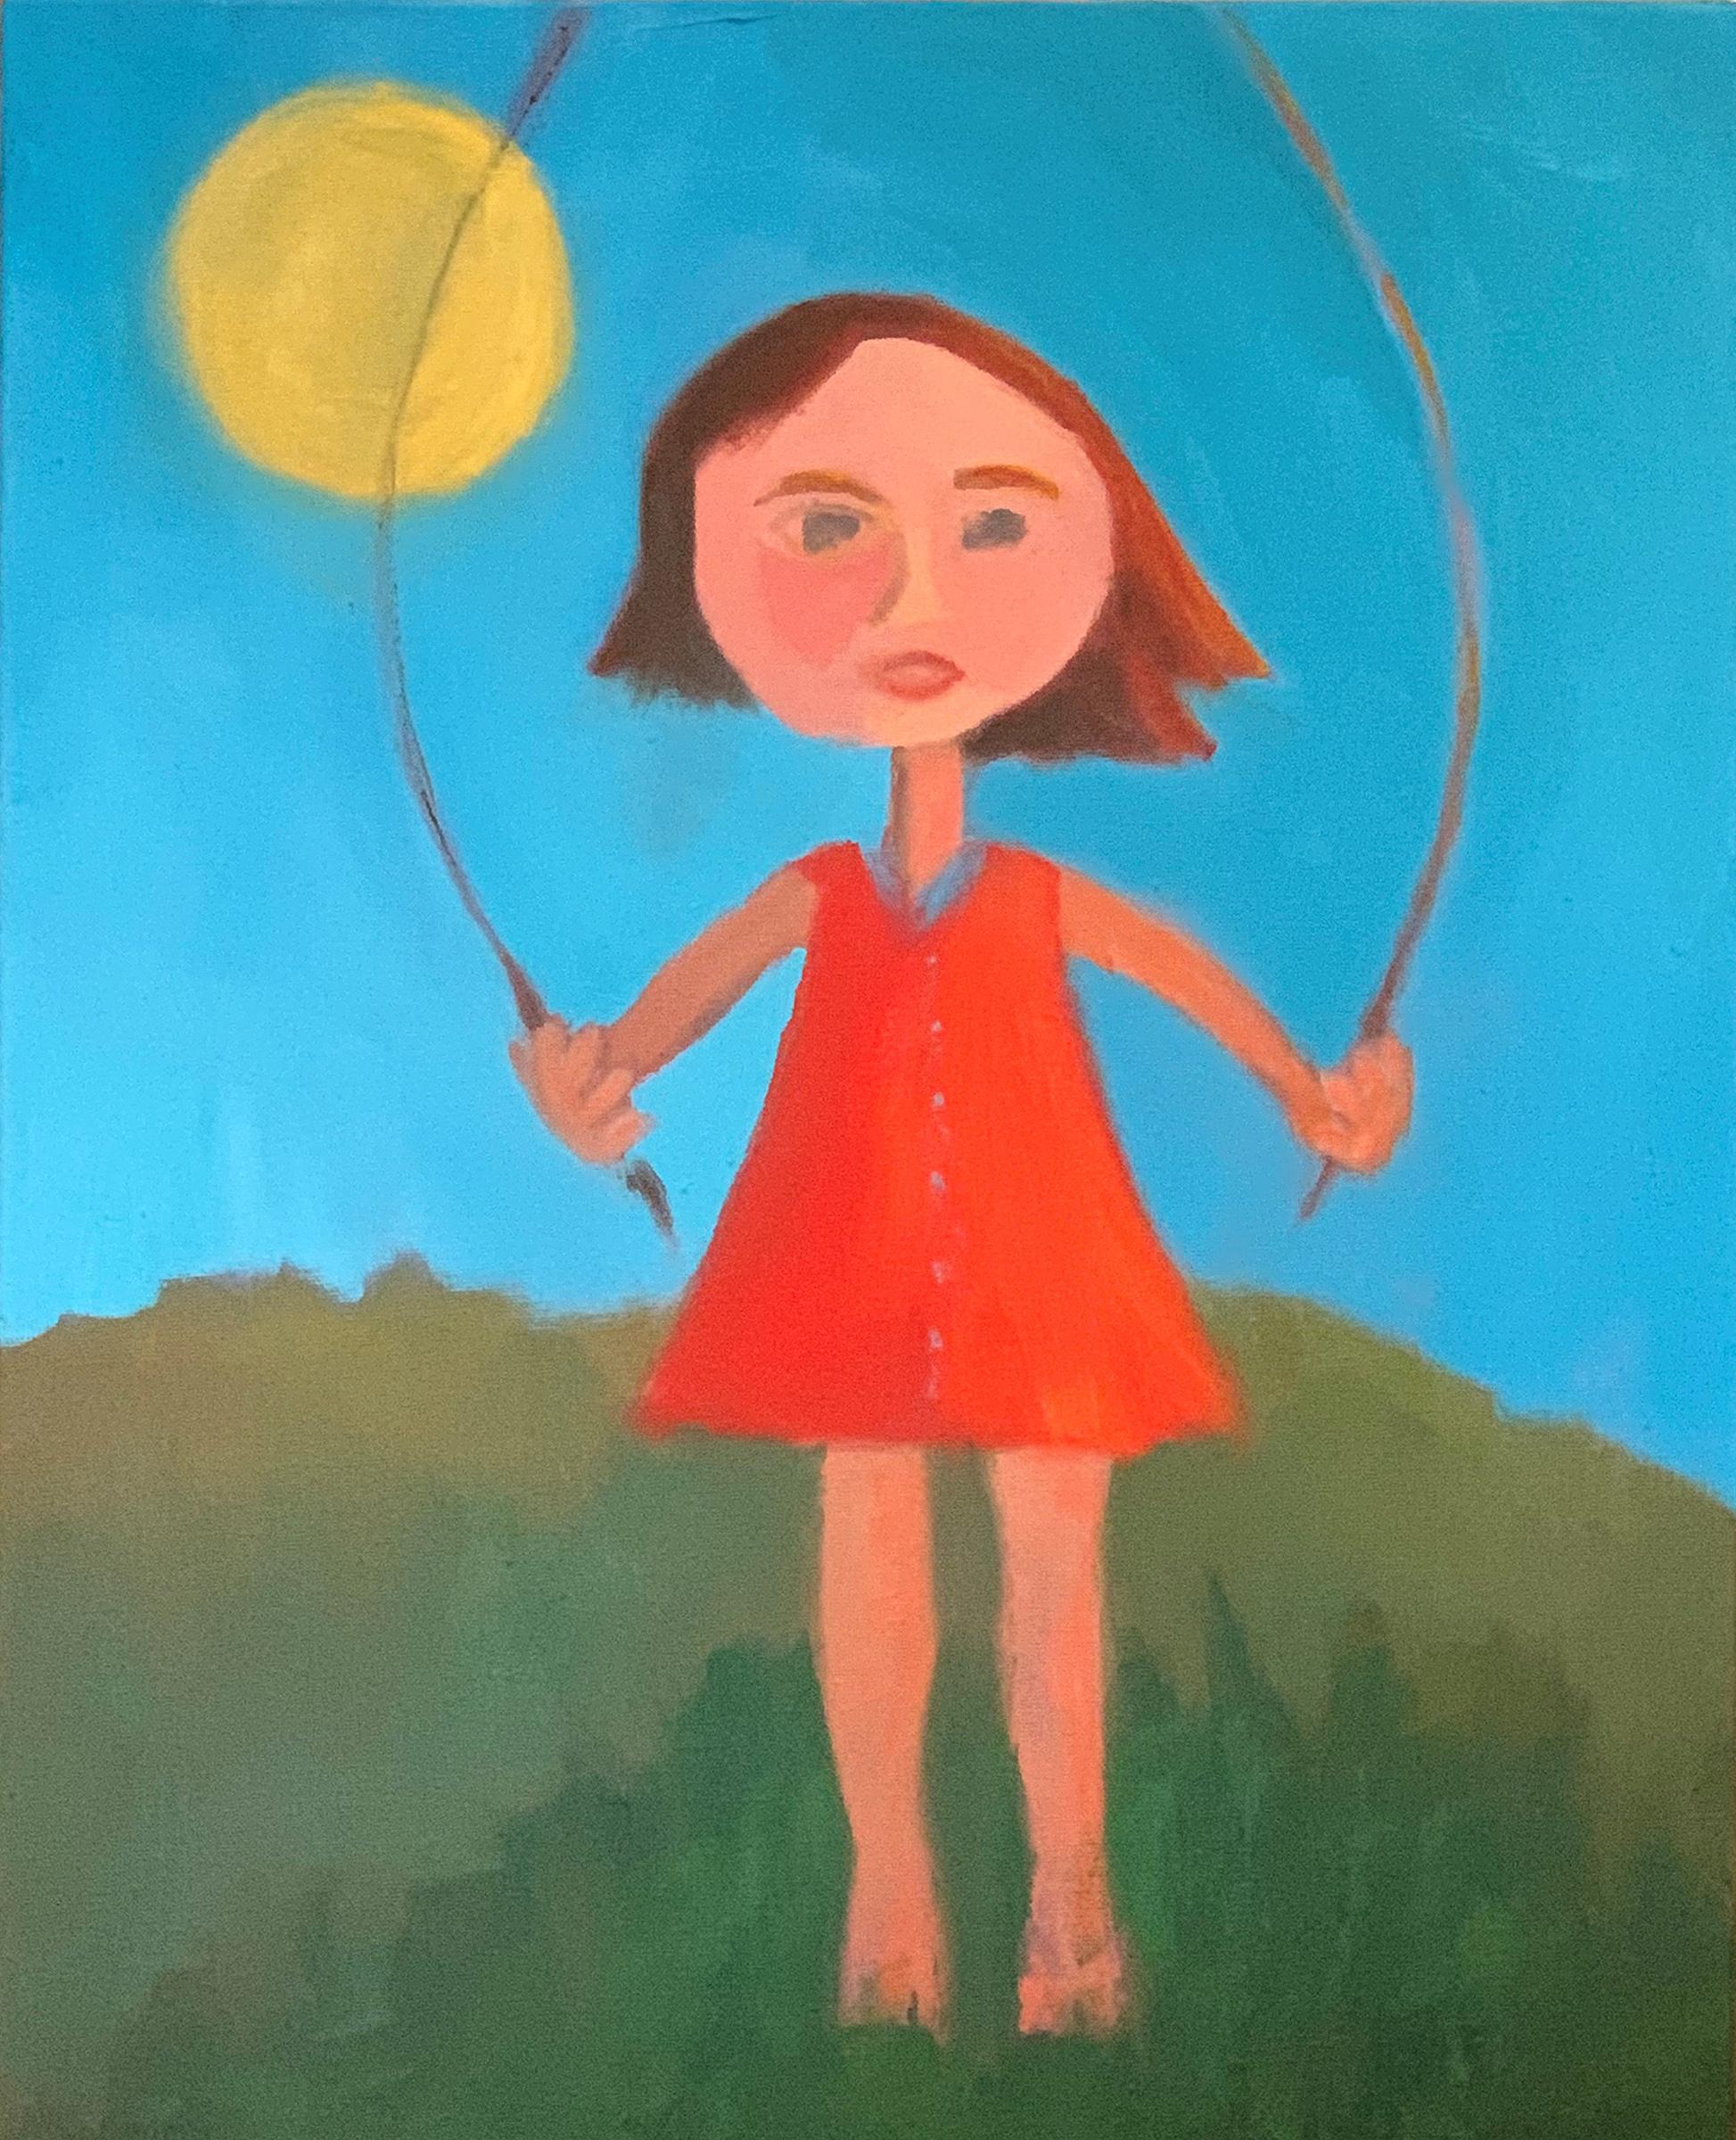 Jumping Rope by  Brenda Fox - Masterpiece Online